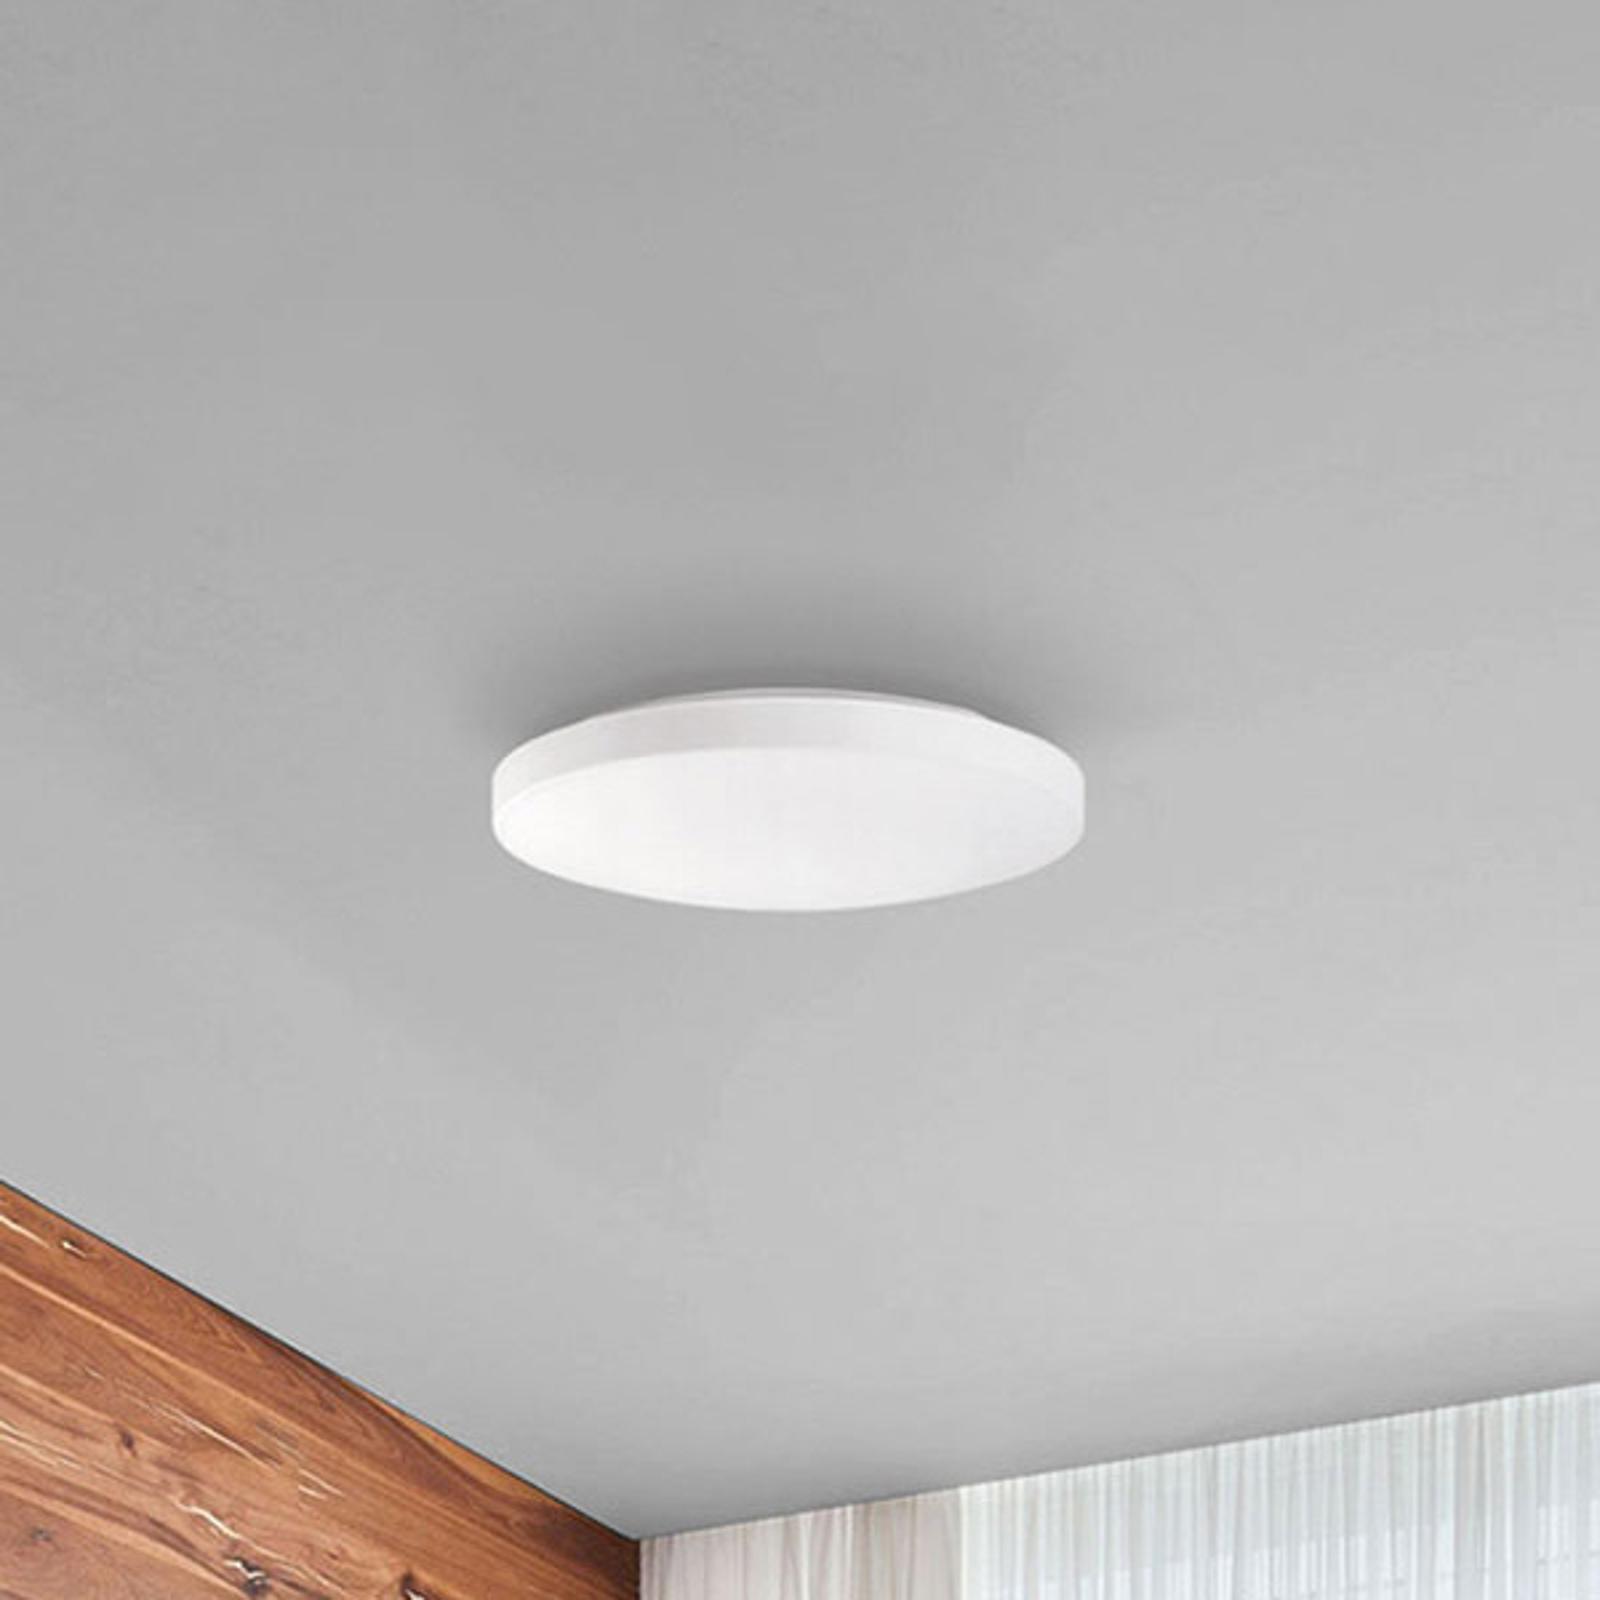 Lampa sufitowa LED Moon Ø 35 cm, 4000K